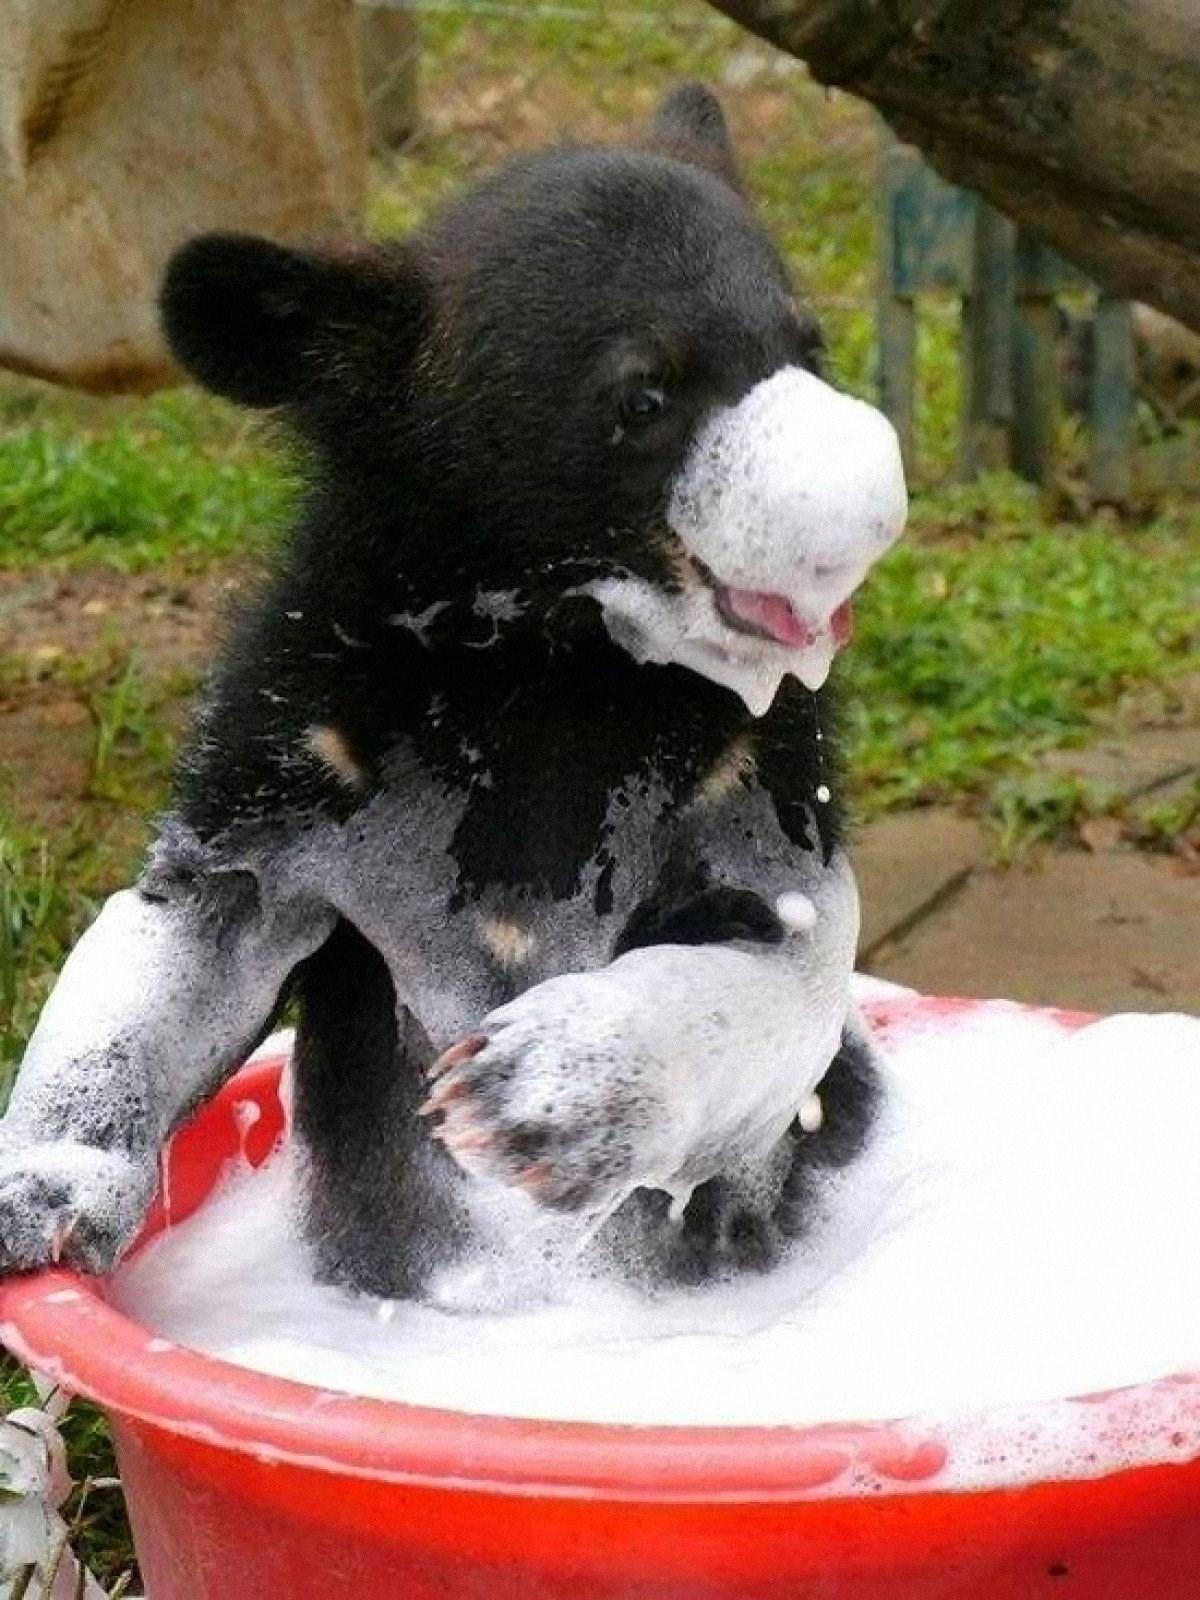 00 animals bath 01. 280715